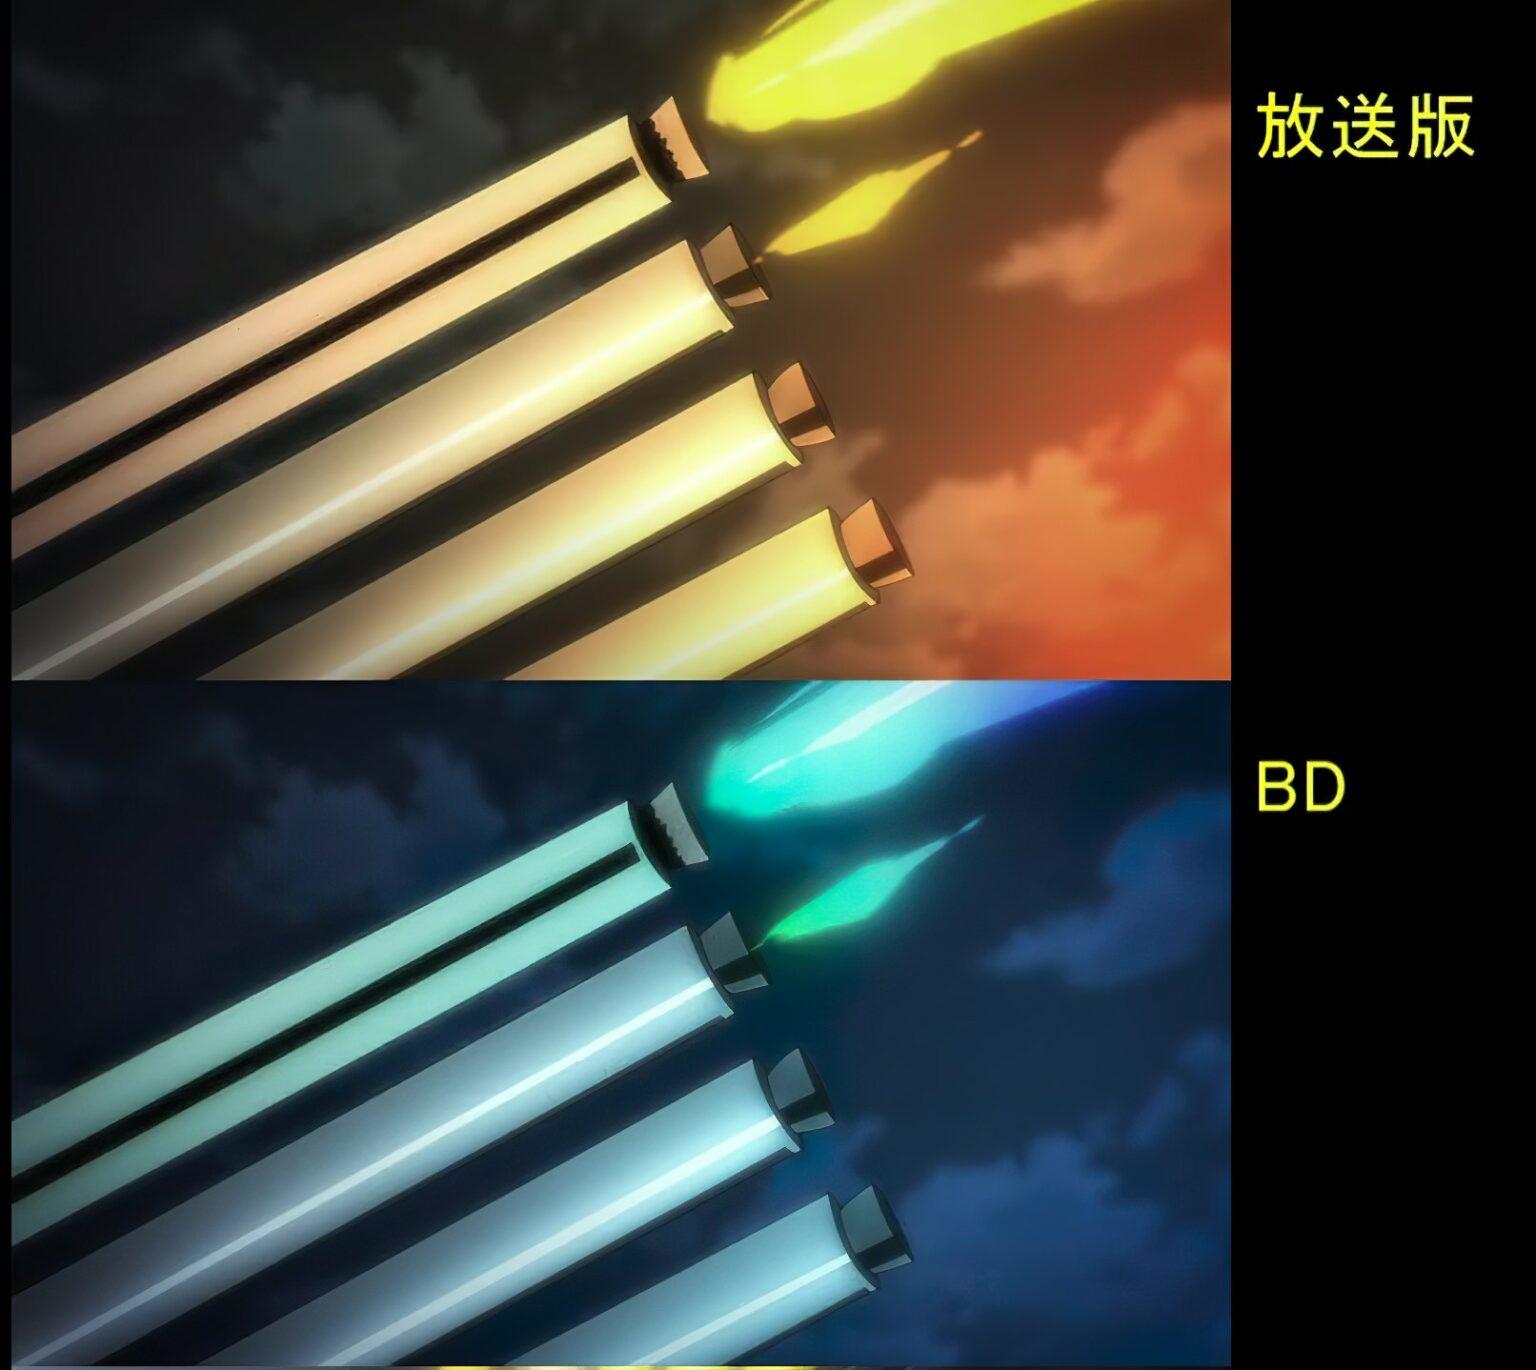 A7 4 1536x1370 - Correções do Anime Shingeki no Kyojin: The Final Season no Blu-ray/DVD.